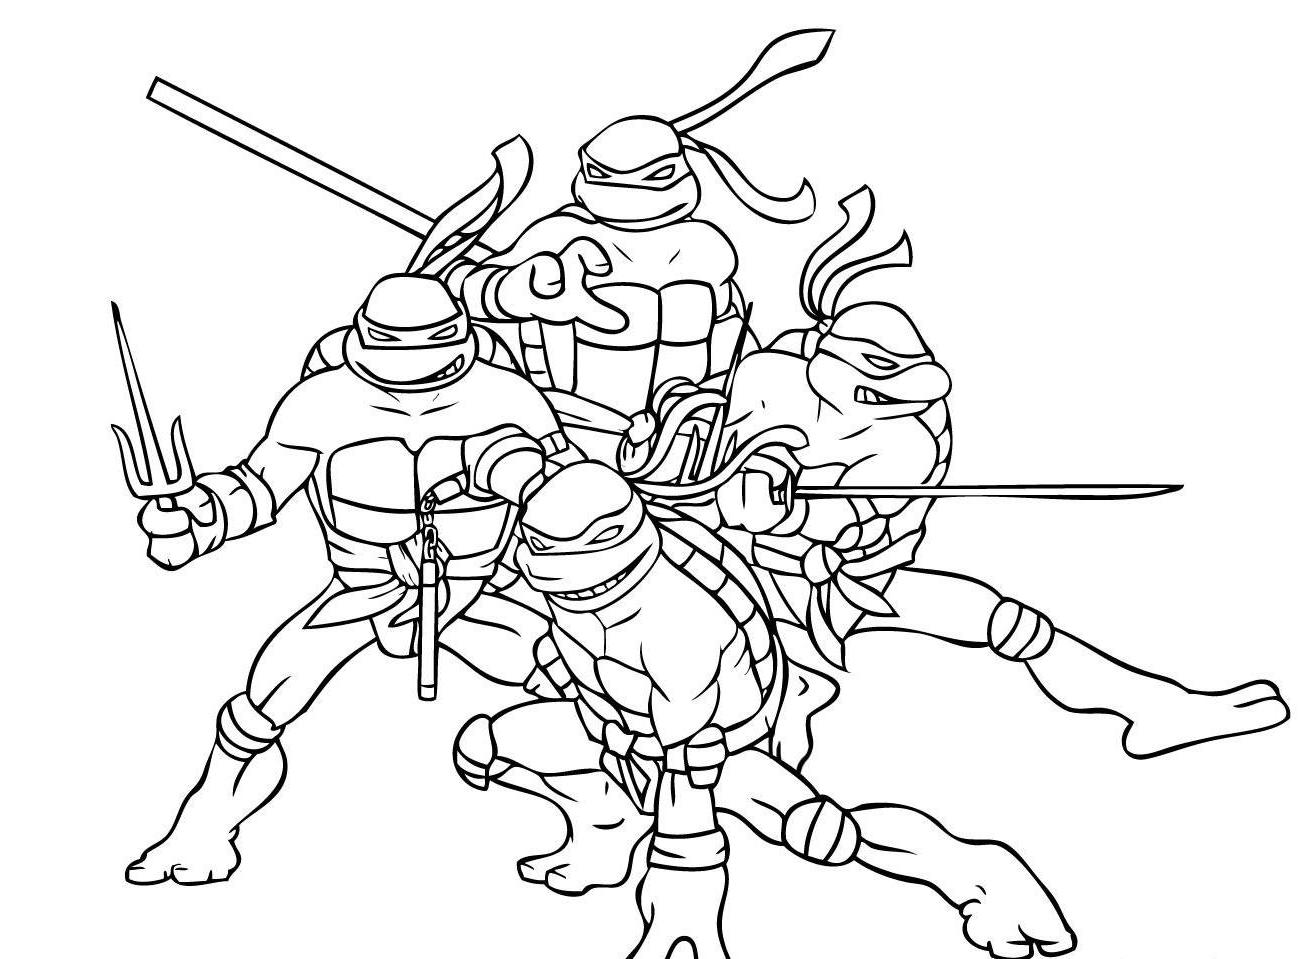 15 Ninja Turtles Coloring Page To Print Print Color Craft